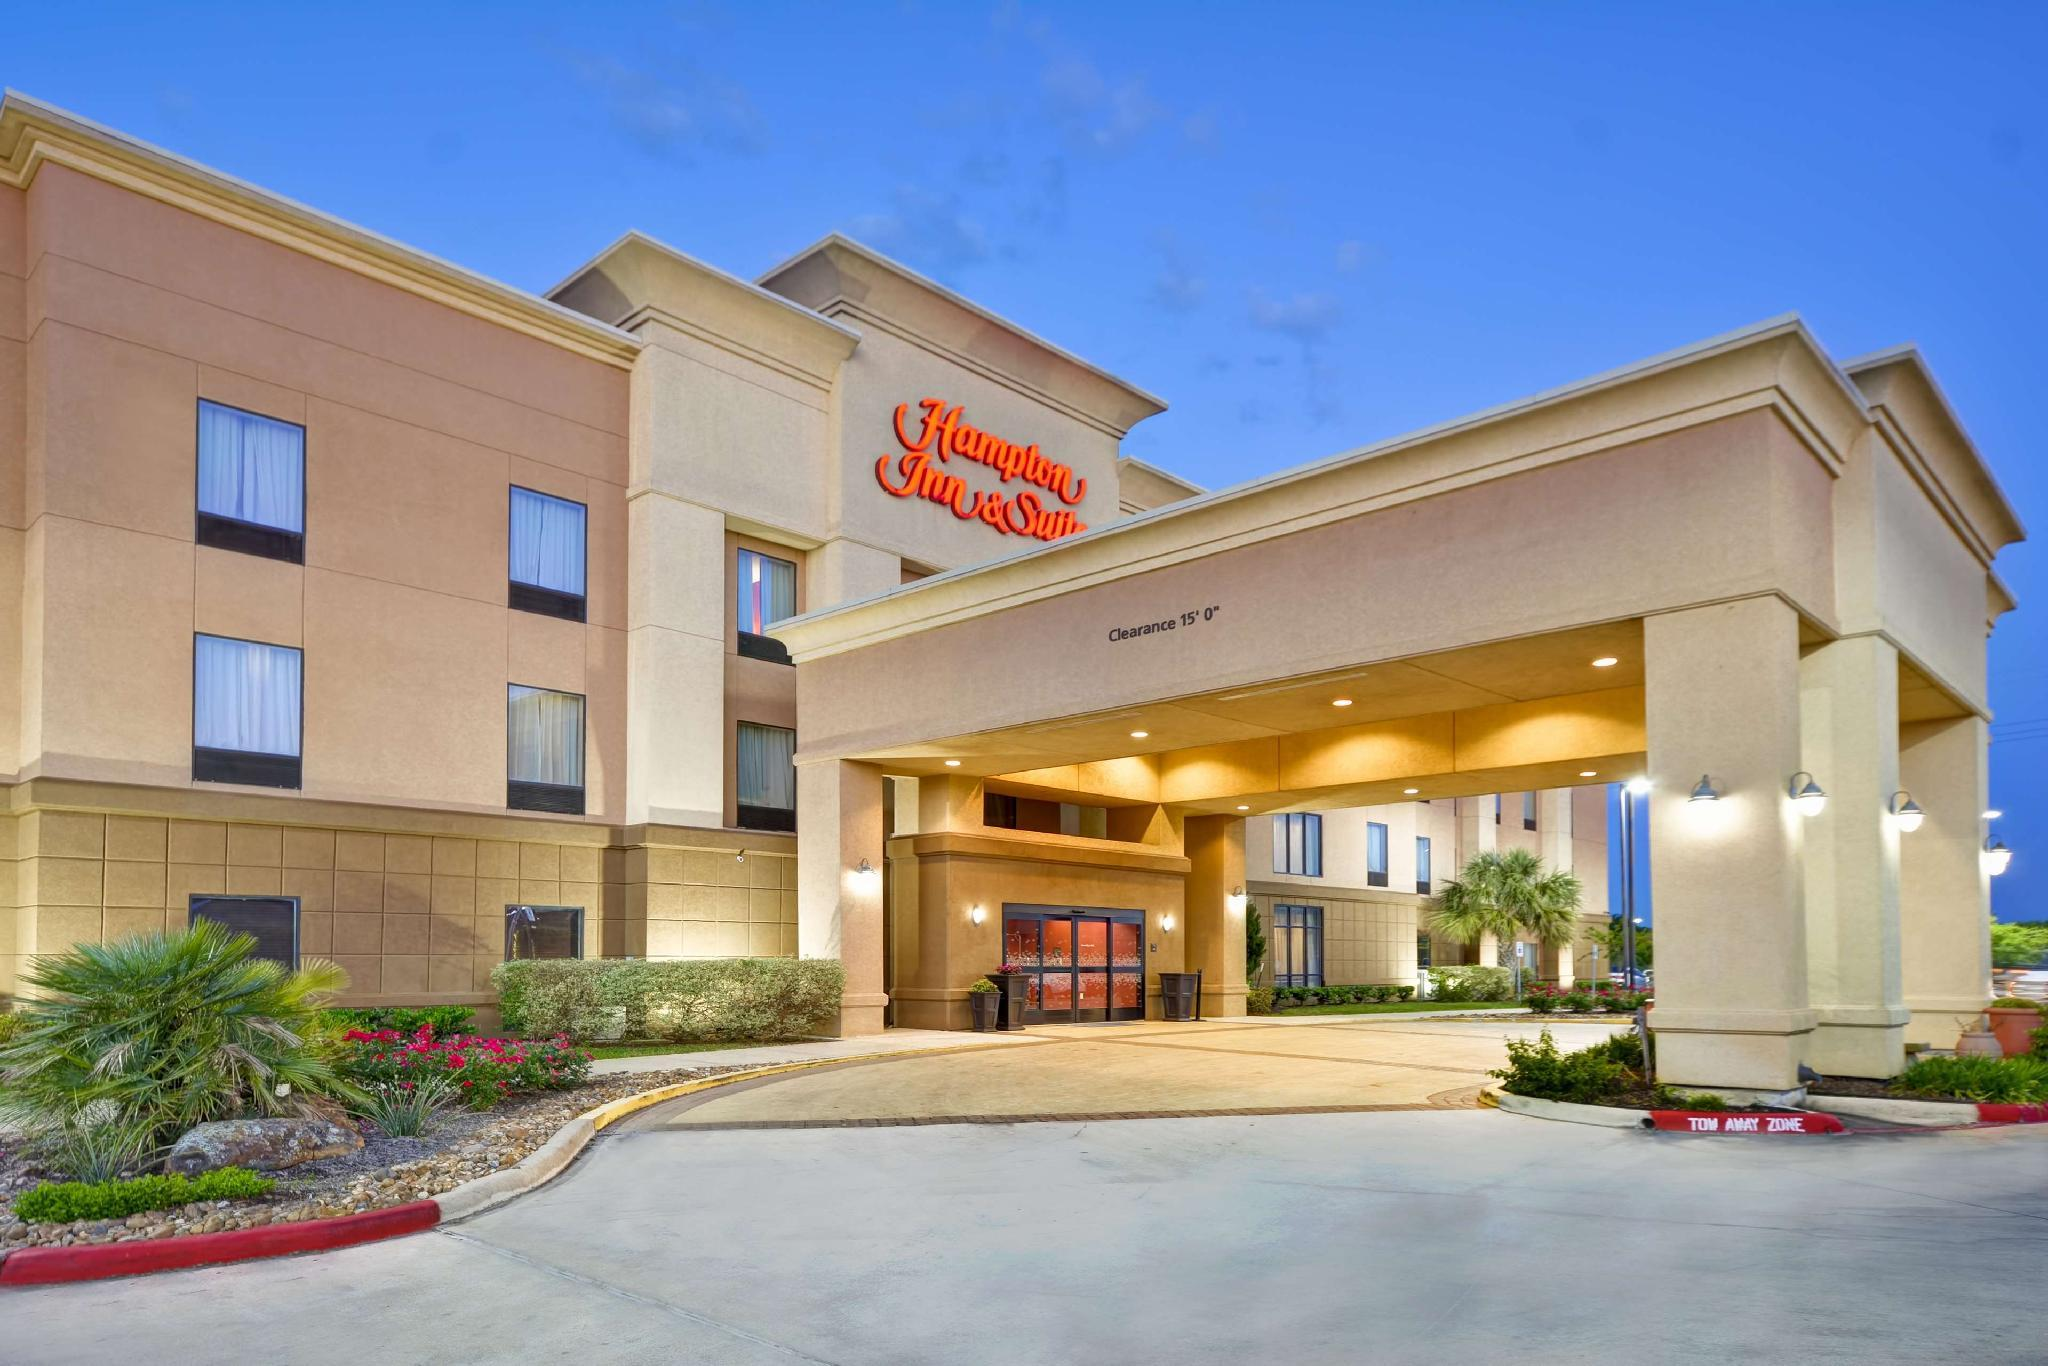 Hampton Inn And Suites Brenham